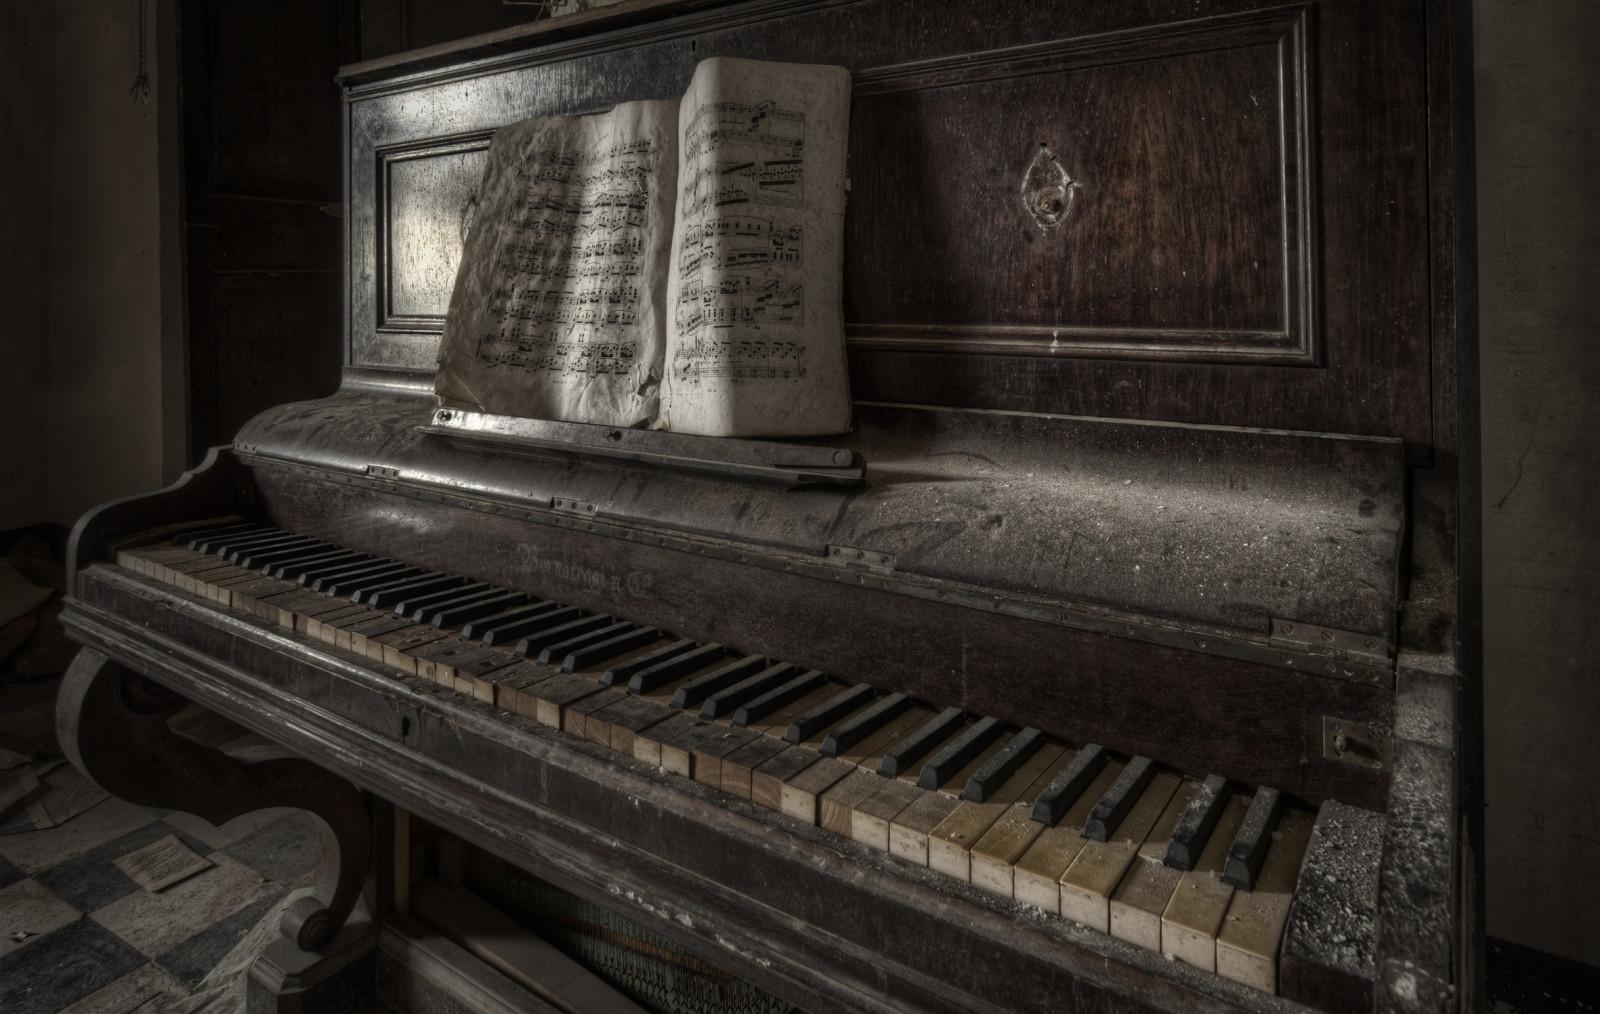 Wallpaper Creepy Horror Abandoned Musical Instrument Spooky HDR Technology Urbex Beautiful Rusty Sigma Vigilantphotographersunite Derelict